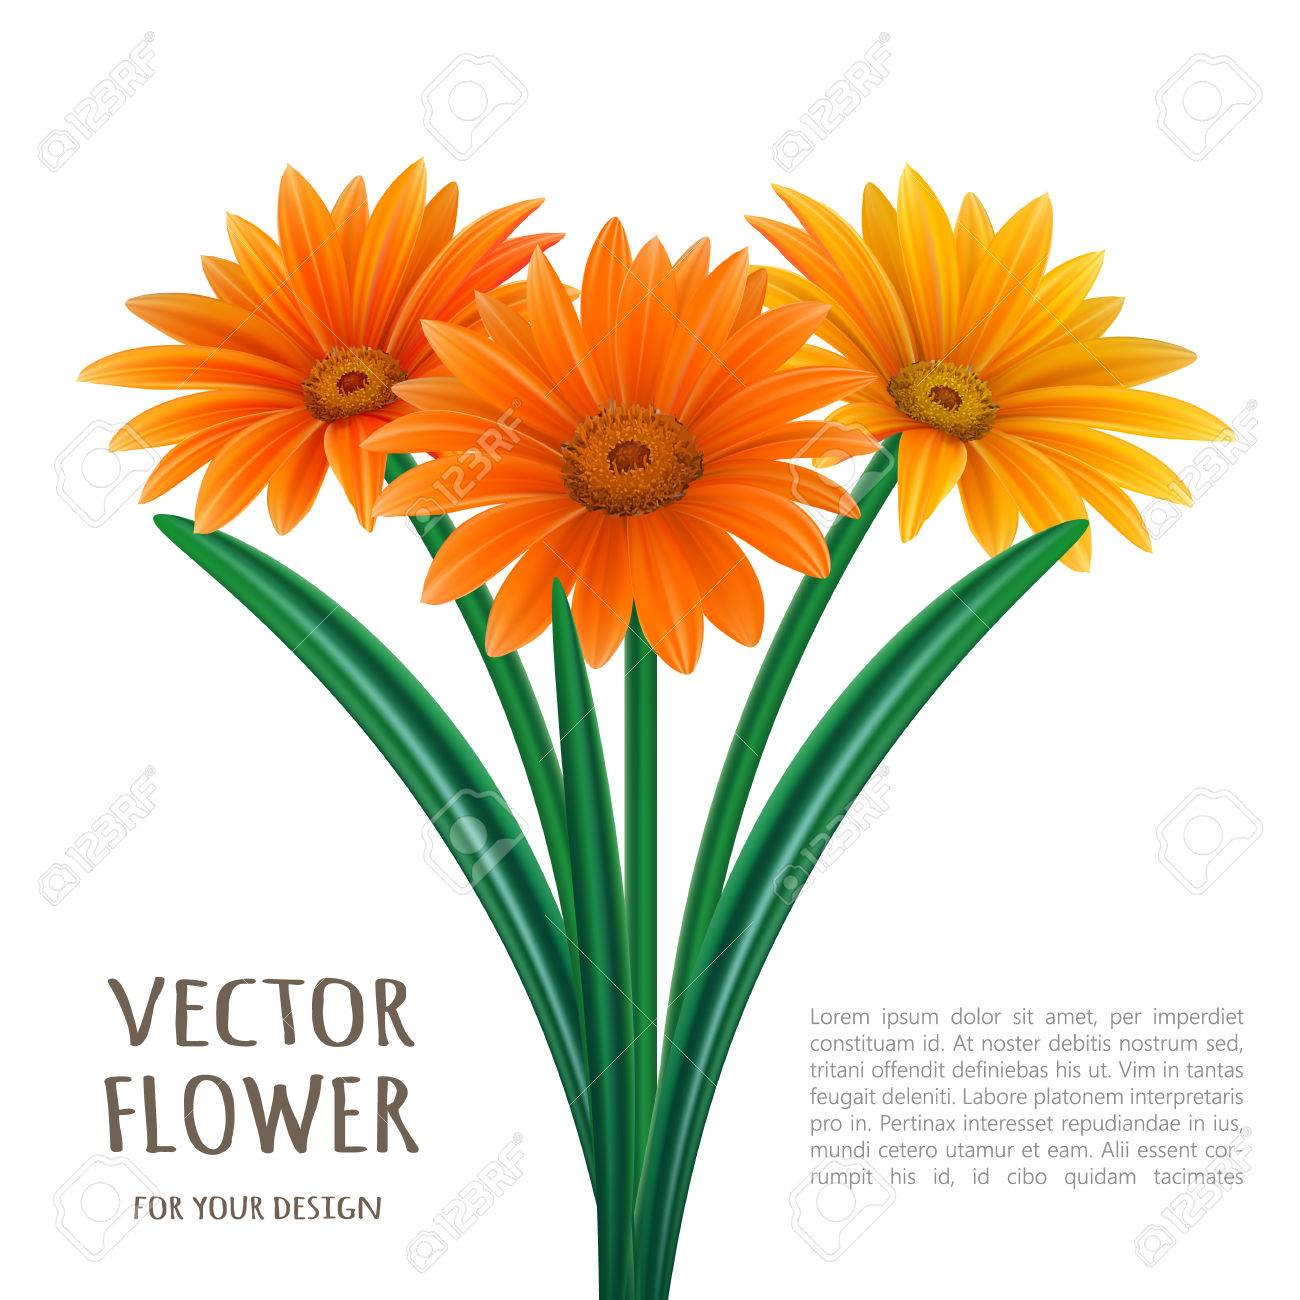 hand drawn vector realistic illustration of gerbera daisy flower rh 123rf com gerbera daisies clip art gerber daisy clip art free